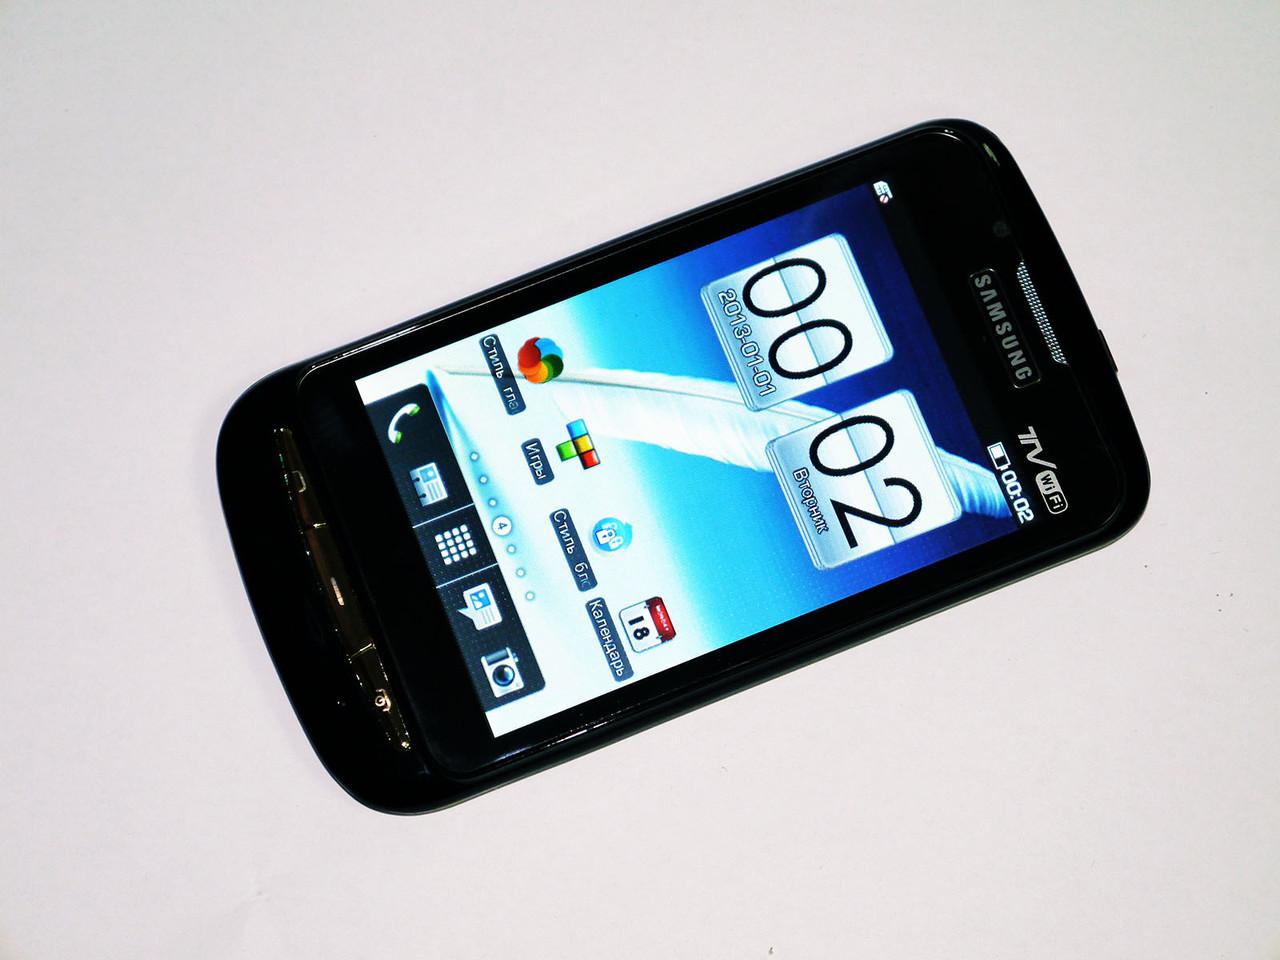 Samsung Galaxy S3 9988 - 2Sim WiFi+ TV- Метал.корпус